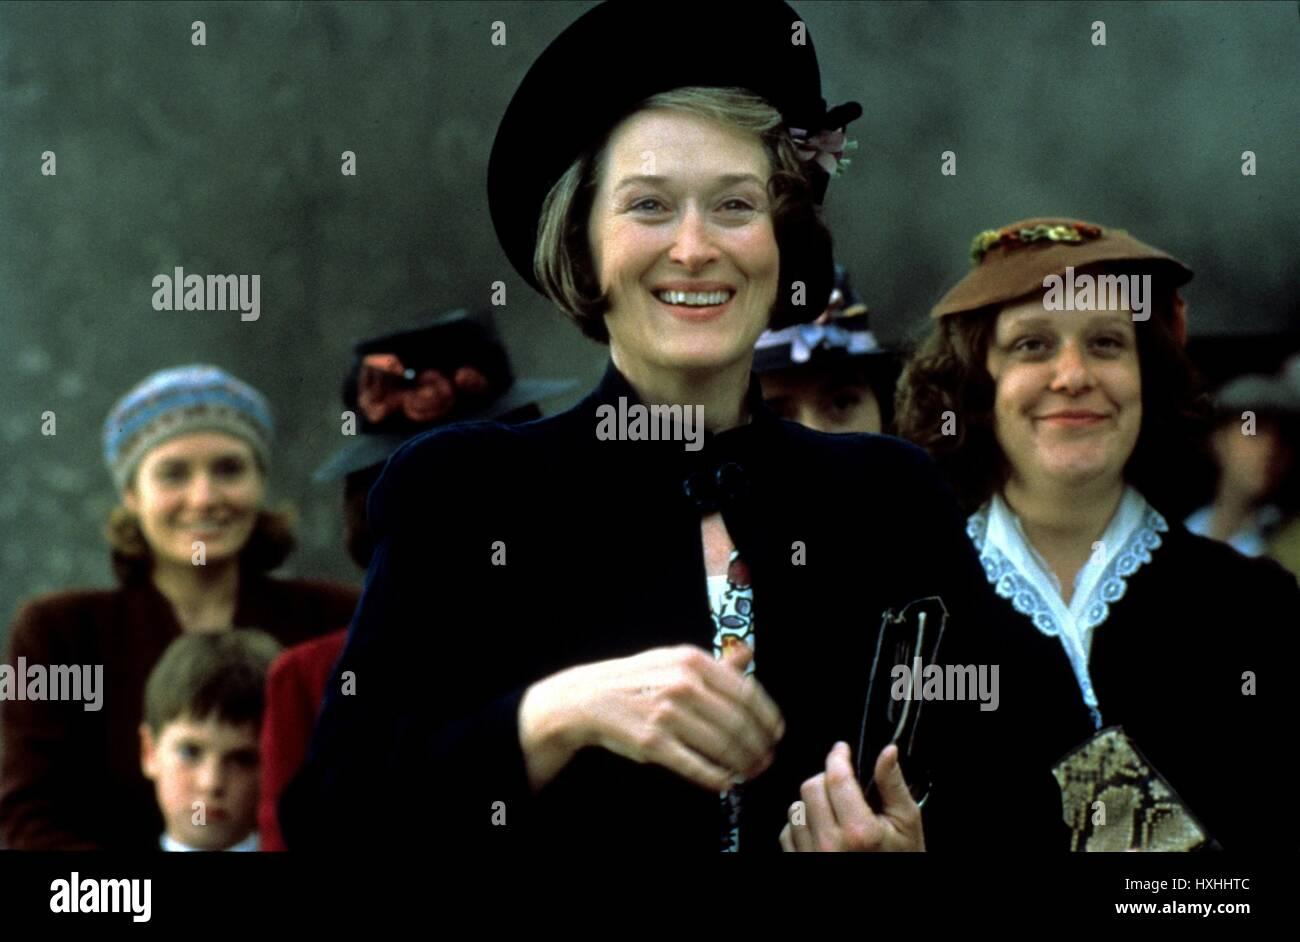 Geraldine Somerville,Leslie Marshall (journalist) Adult pictures Afton Williamson,Sienna Guillory (born 1975)